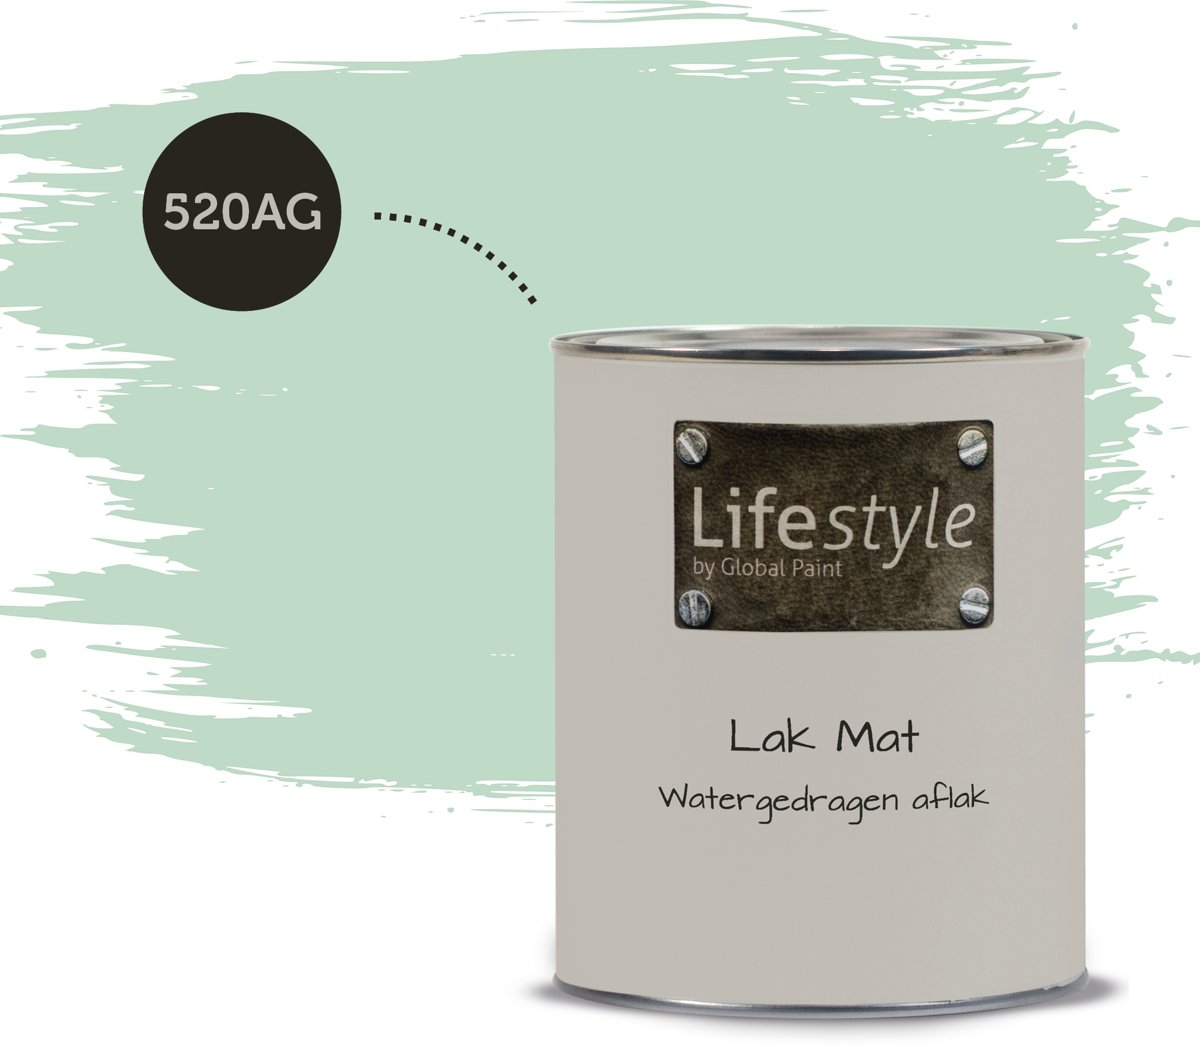 Lifestyle Lak Mat | 520AG | 1 liter